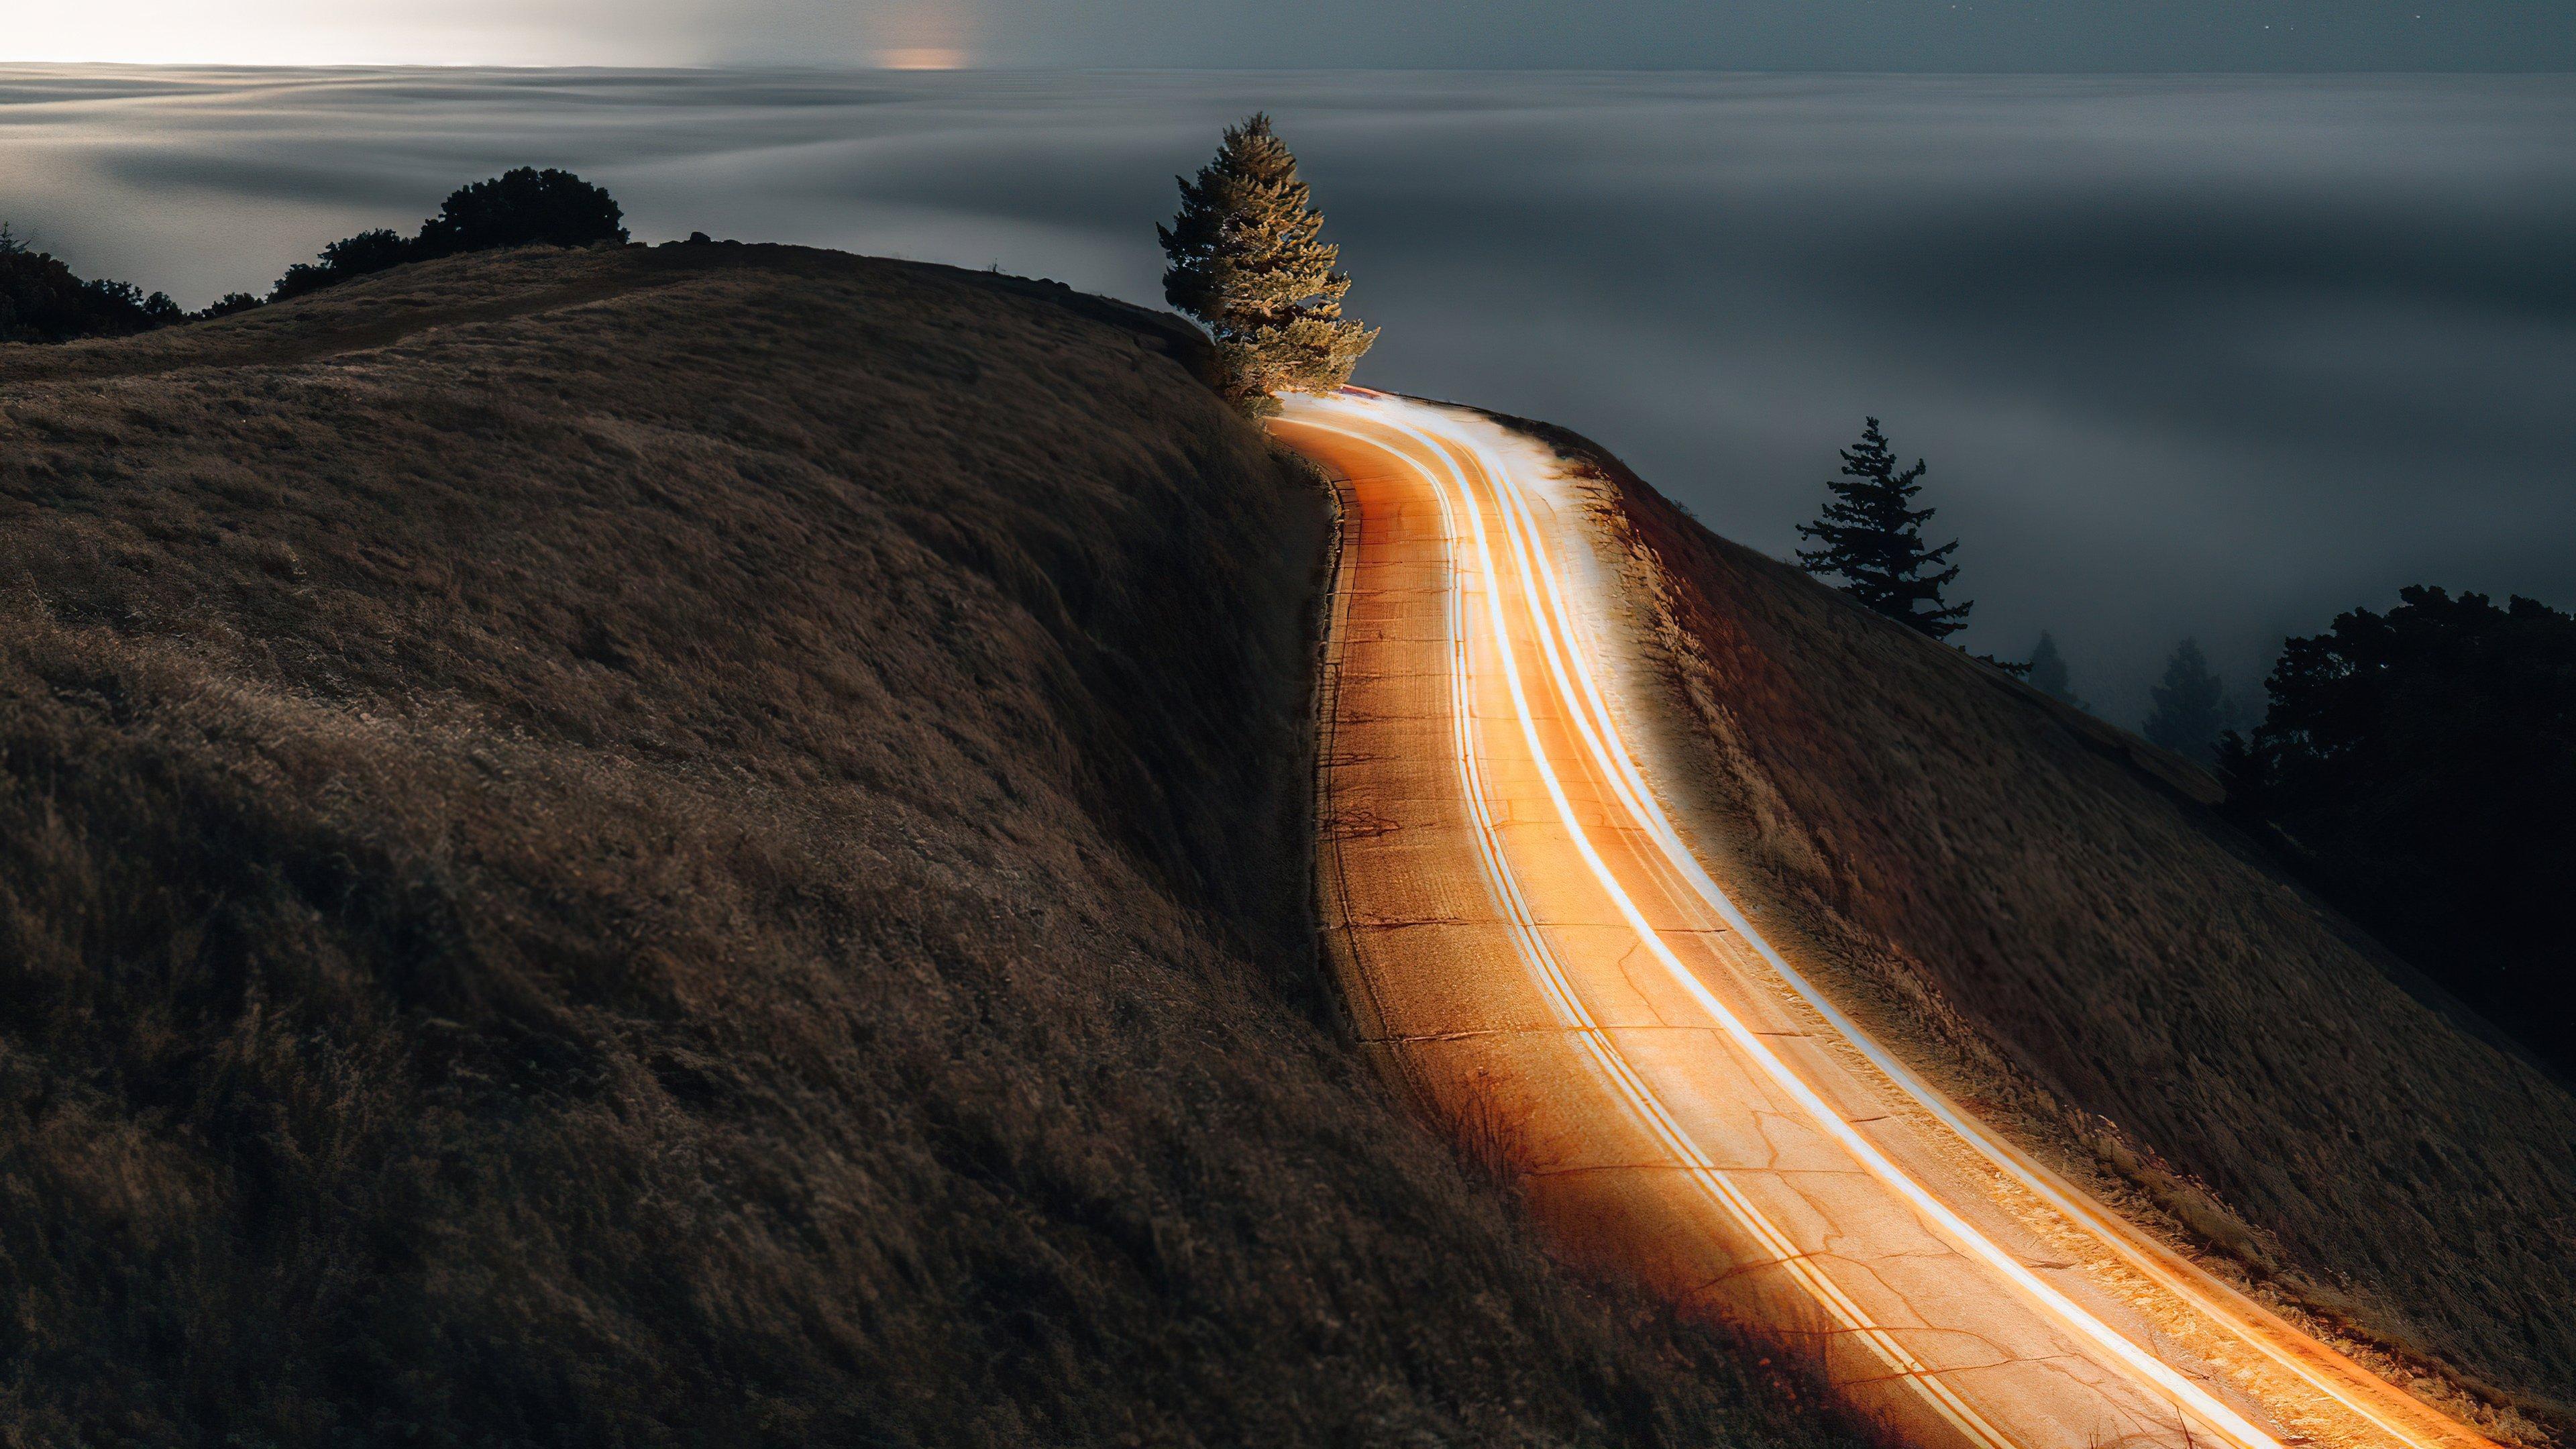 Fondos de pantalla Carretera al amanecer larga exposición